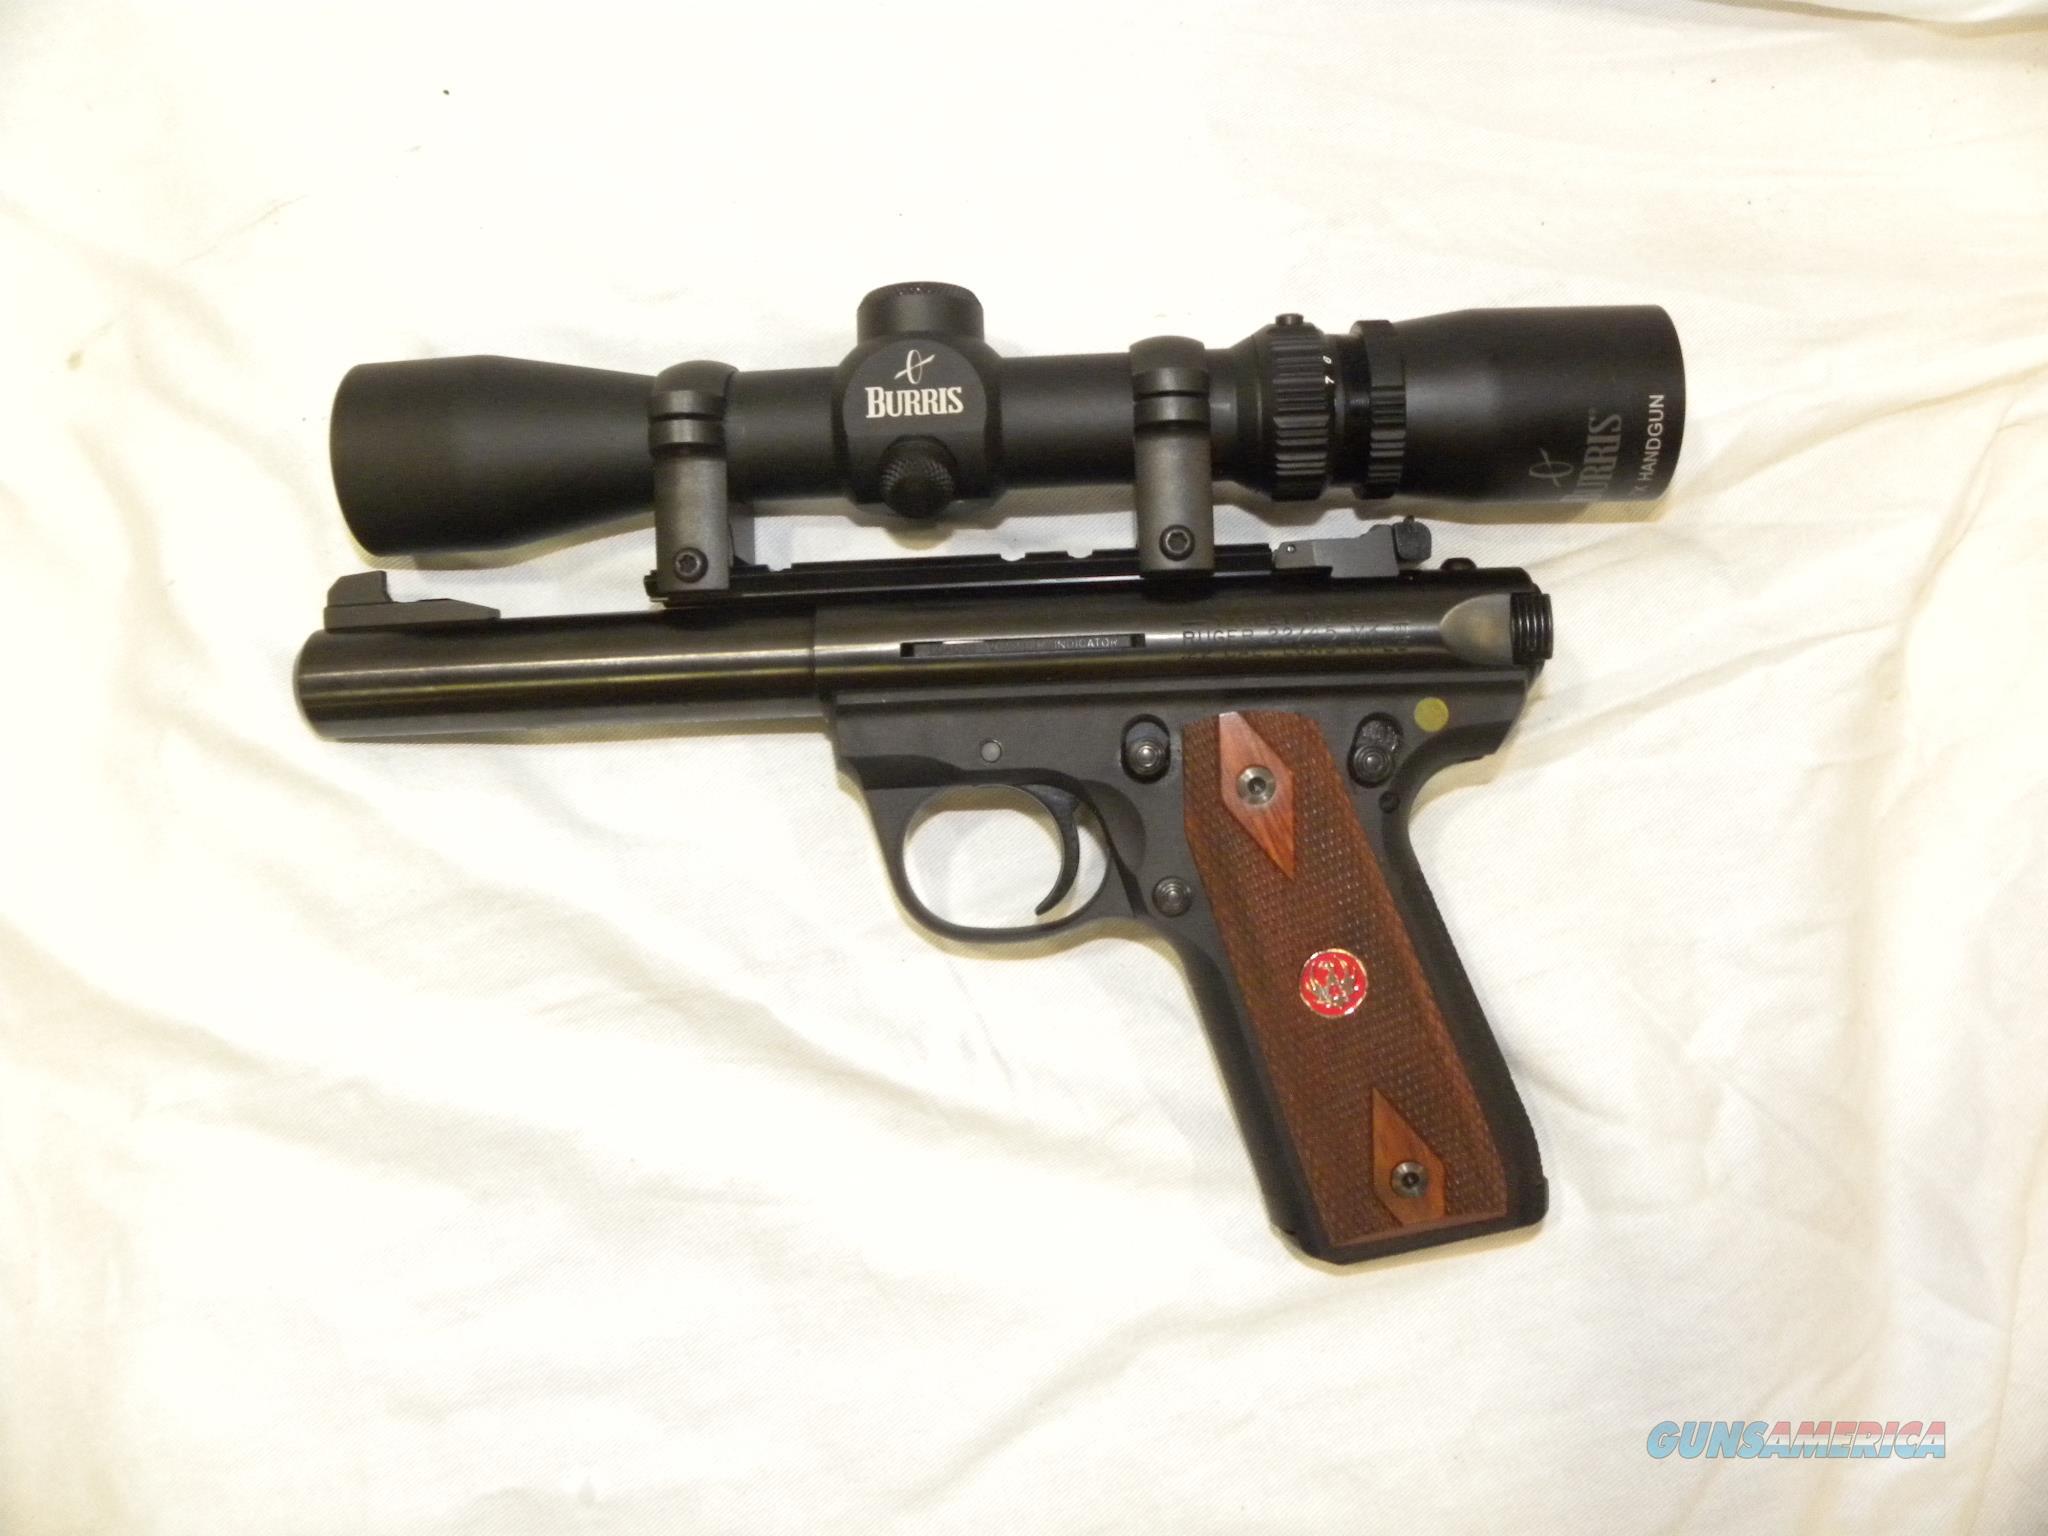 Ruger 22/45 MK III Target w/ Burris Pistol Scope  Guns > Pistols > Ruger Semi-Auto Pistols > 22/45